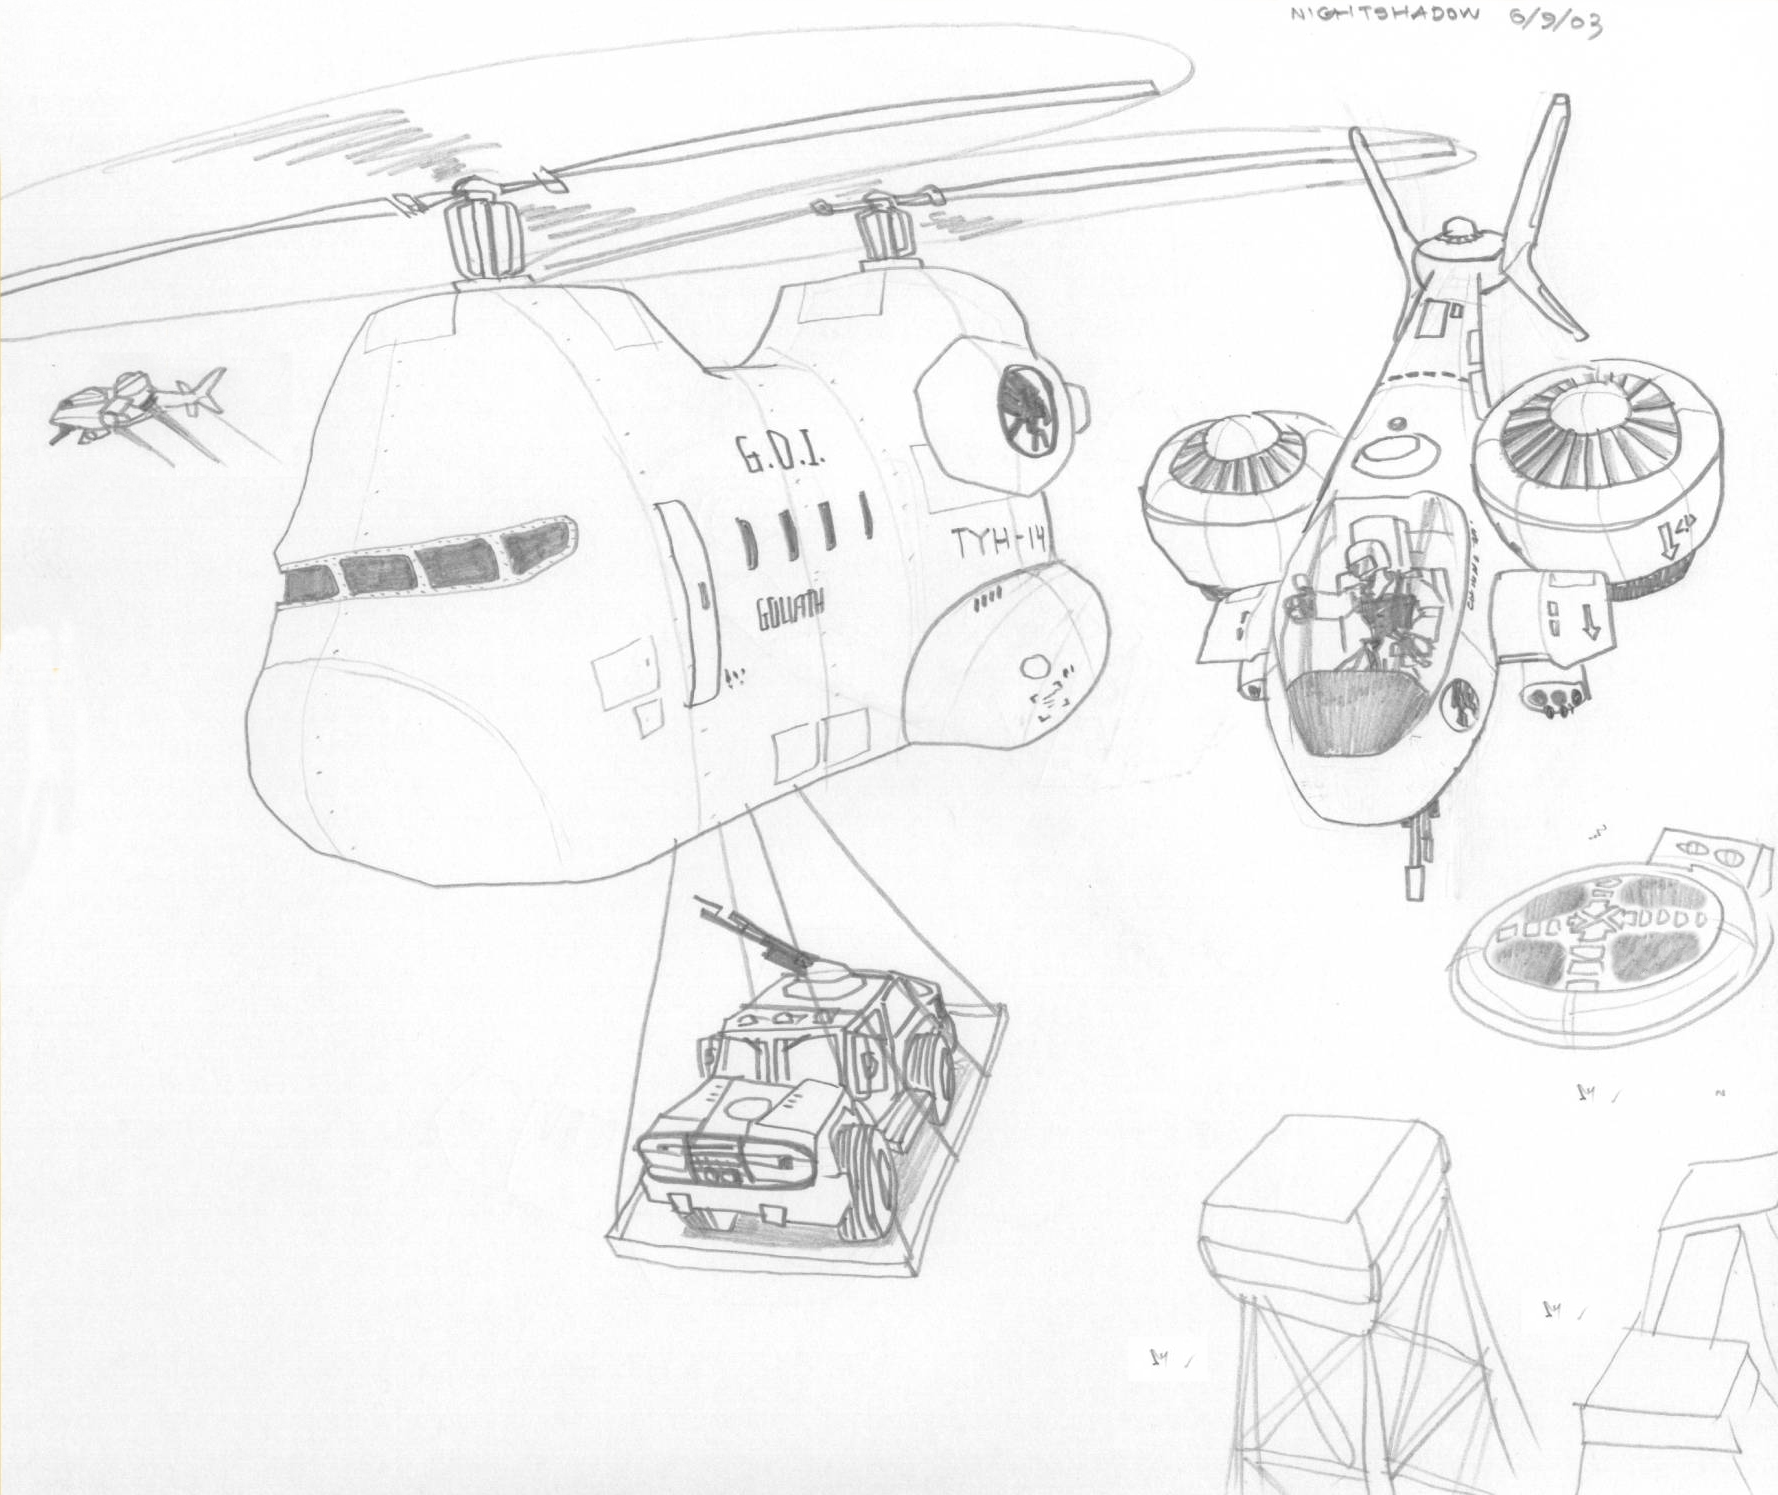 1778x1495 chopper carrying humvee by nightshadow02 on deviantart